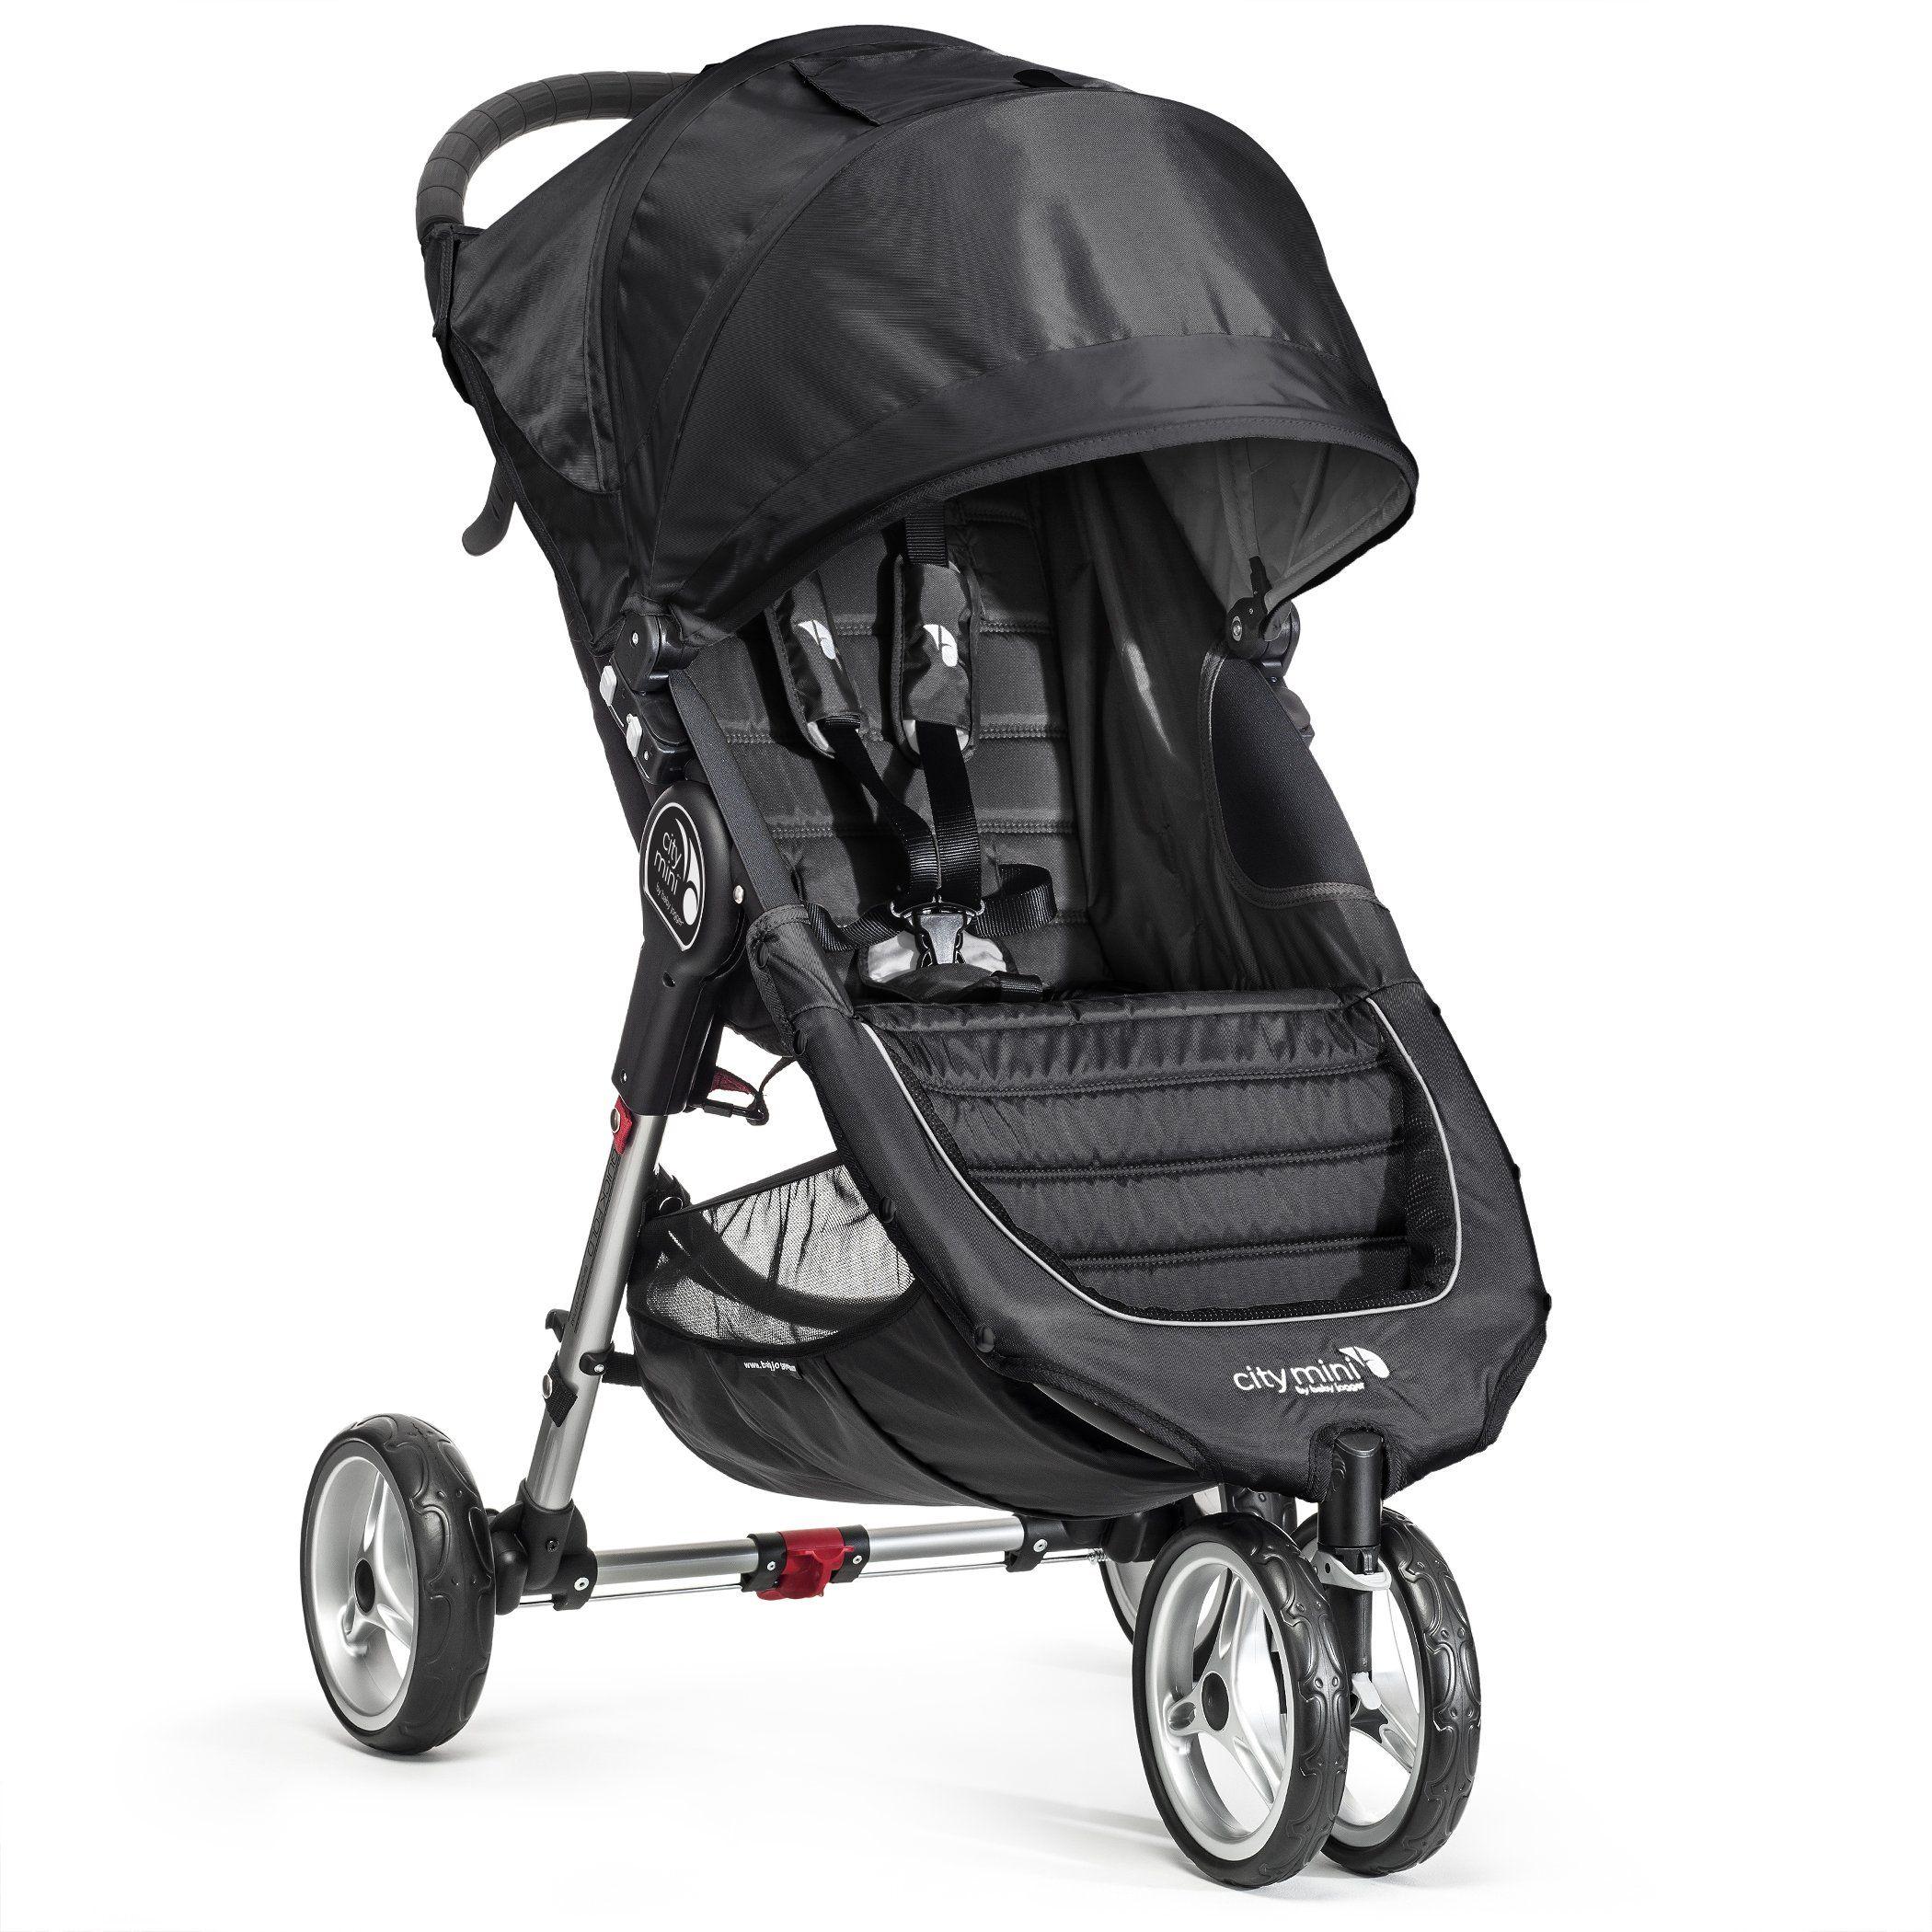 Amazon.com : Baby Jogger City Mini Single Stroller, Black ...